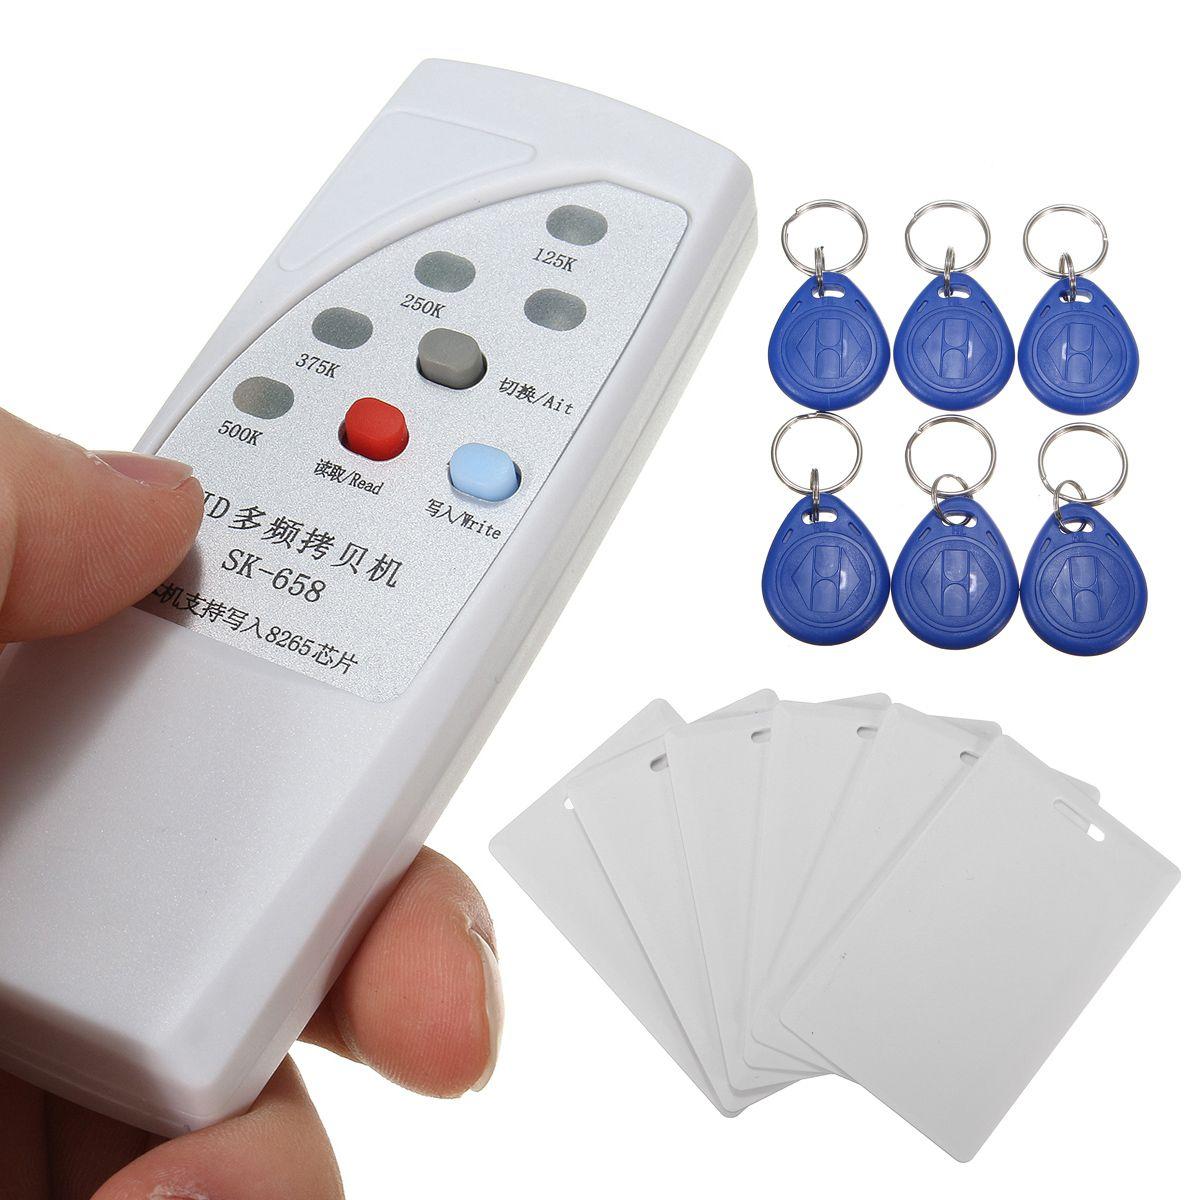 Safurance SK-658 13 stücke Handheld 125 khz RFID ID Card Reader Writer Kopierer Duplizierer Programmierer + 6 stücke Karten + 6 stücke Tags